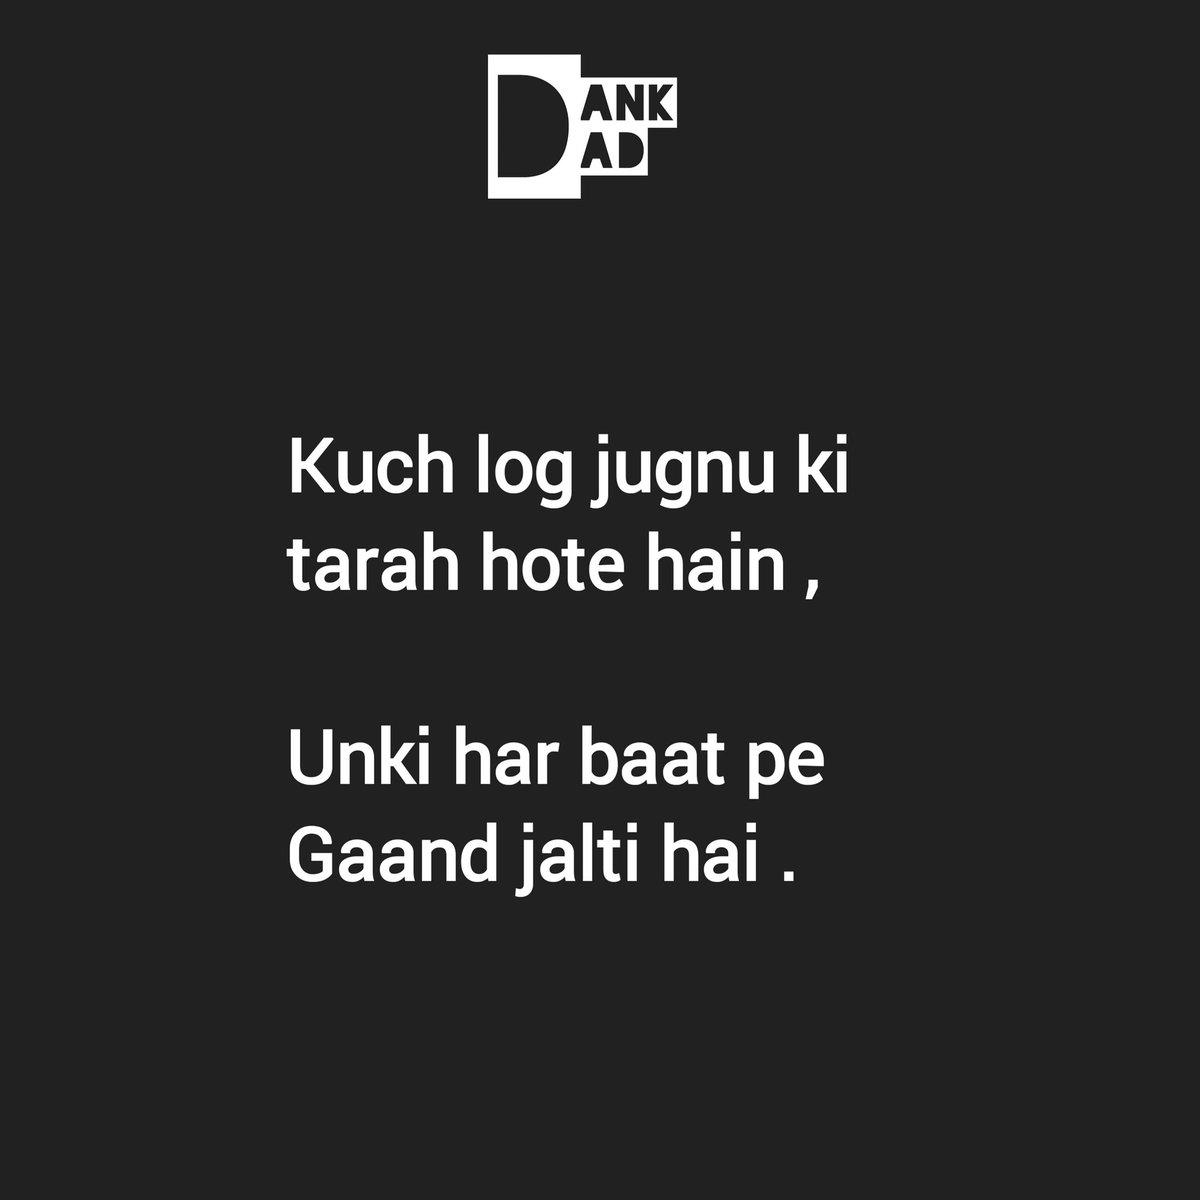 Follow @_dank_dad_ for more ....#fun #jokeoftheday #laugh  #dankjokes #nonvegjokes #follow #funny #jokes #sarcasm #FF #likes #comedyindia #backchodi #sacredmemes #bollywoodpic.twitter.com/f6IJopQNn4